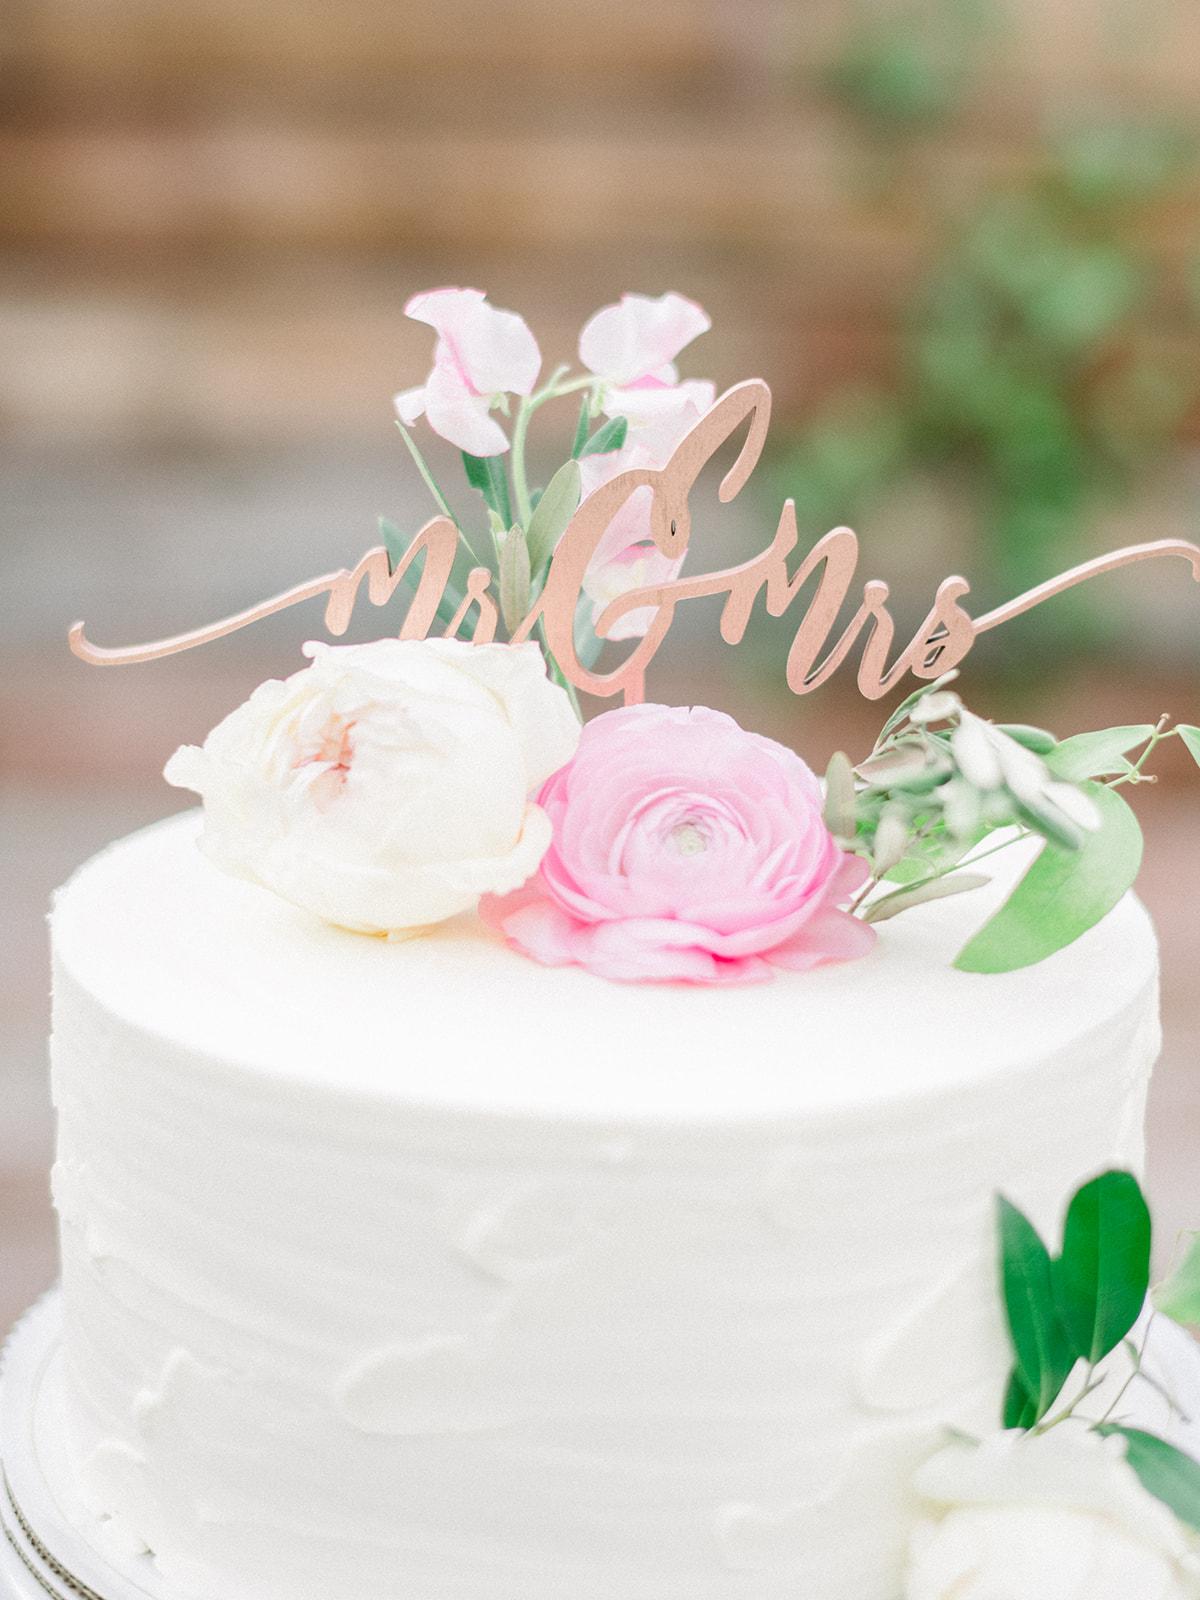 jueunandjon-etherandsmith-wedding-1052.jpg